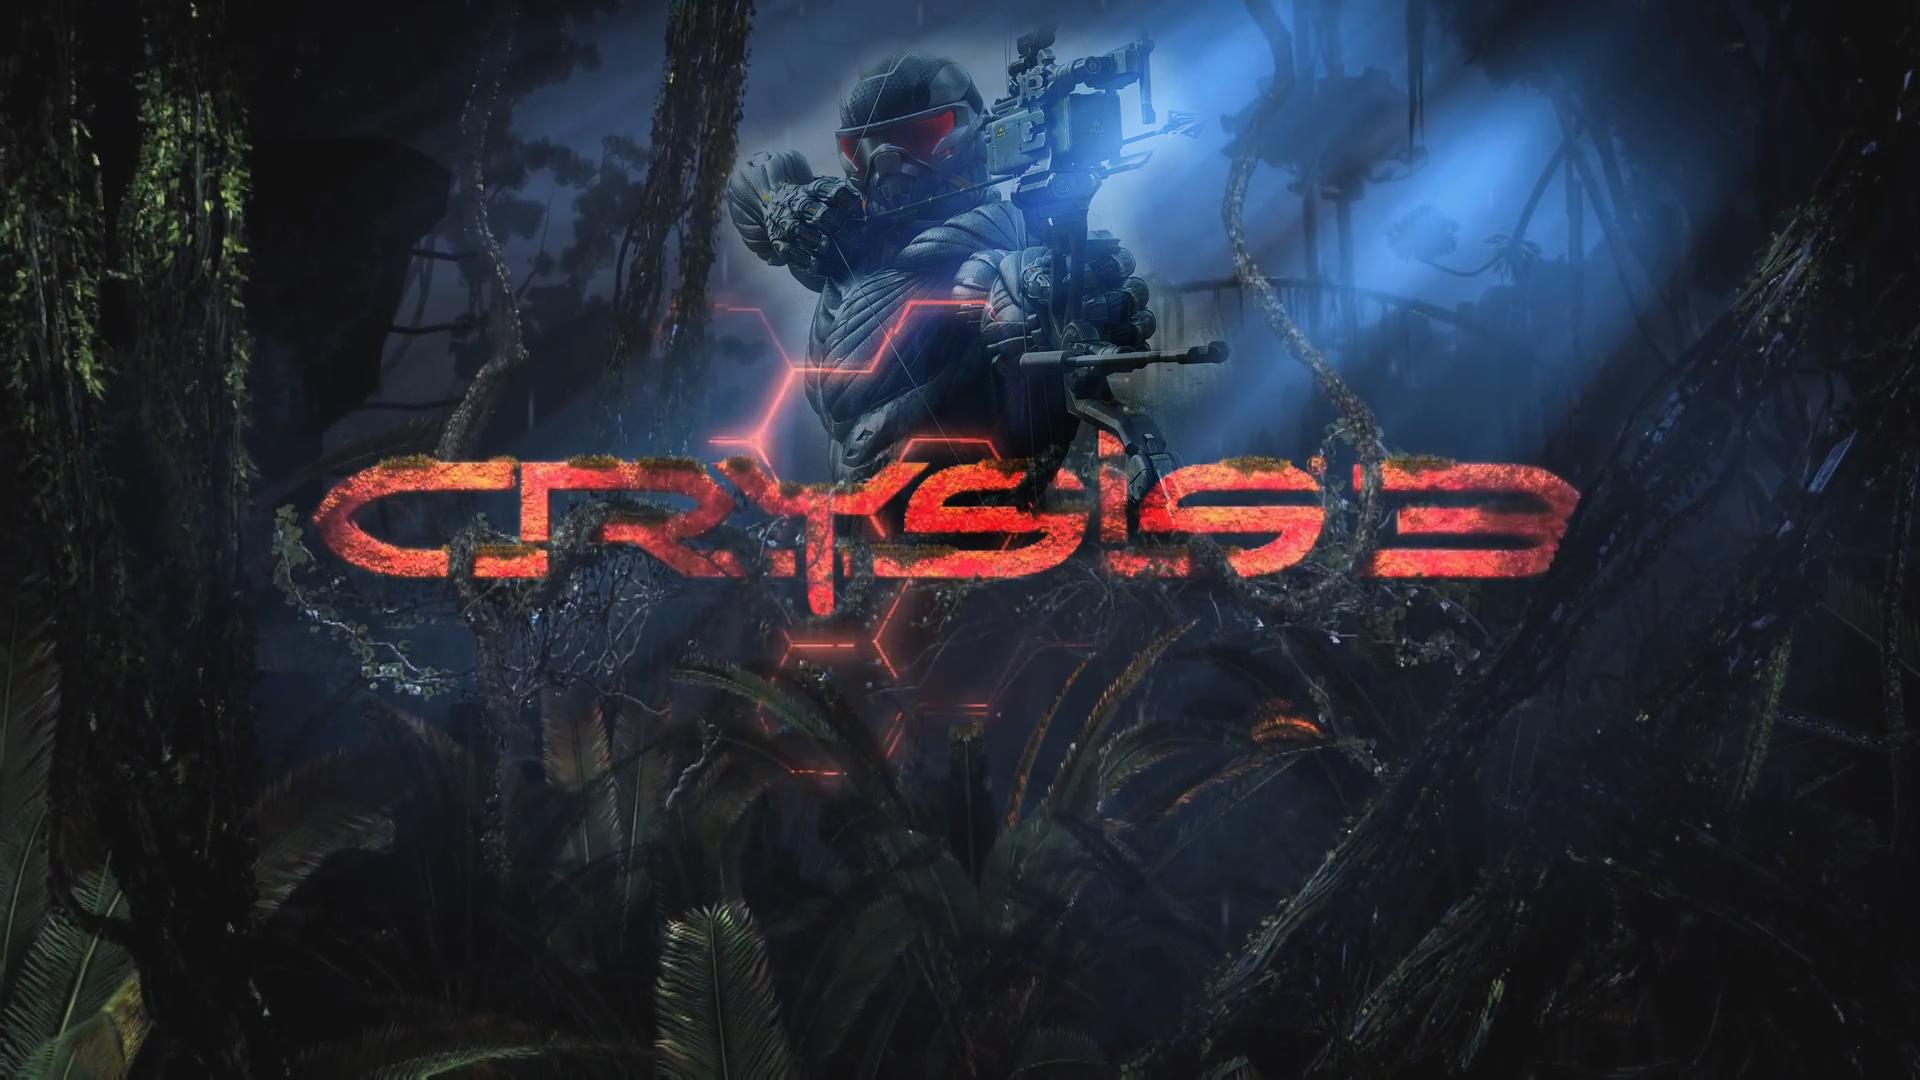 دانلود کرک Crysis 3